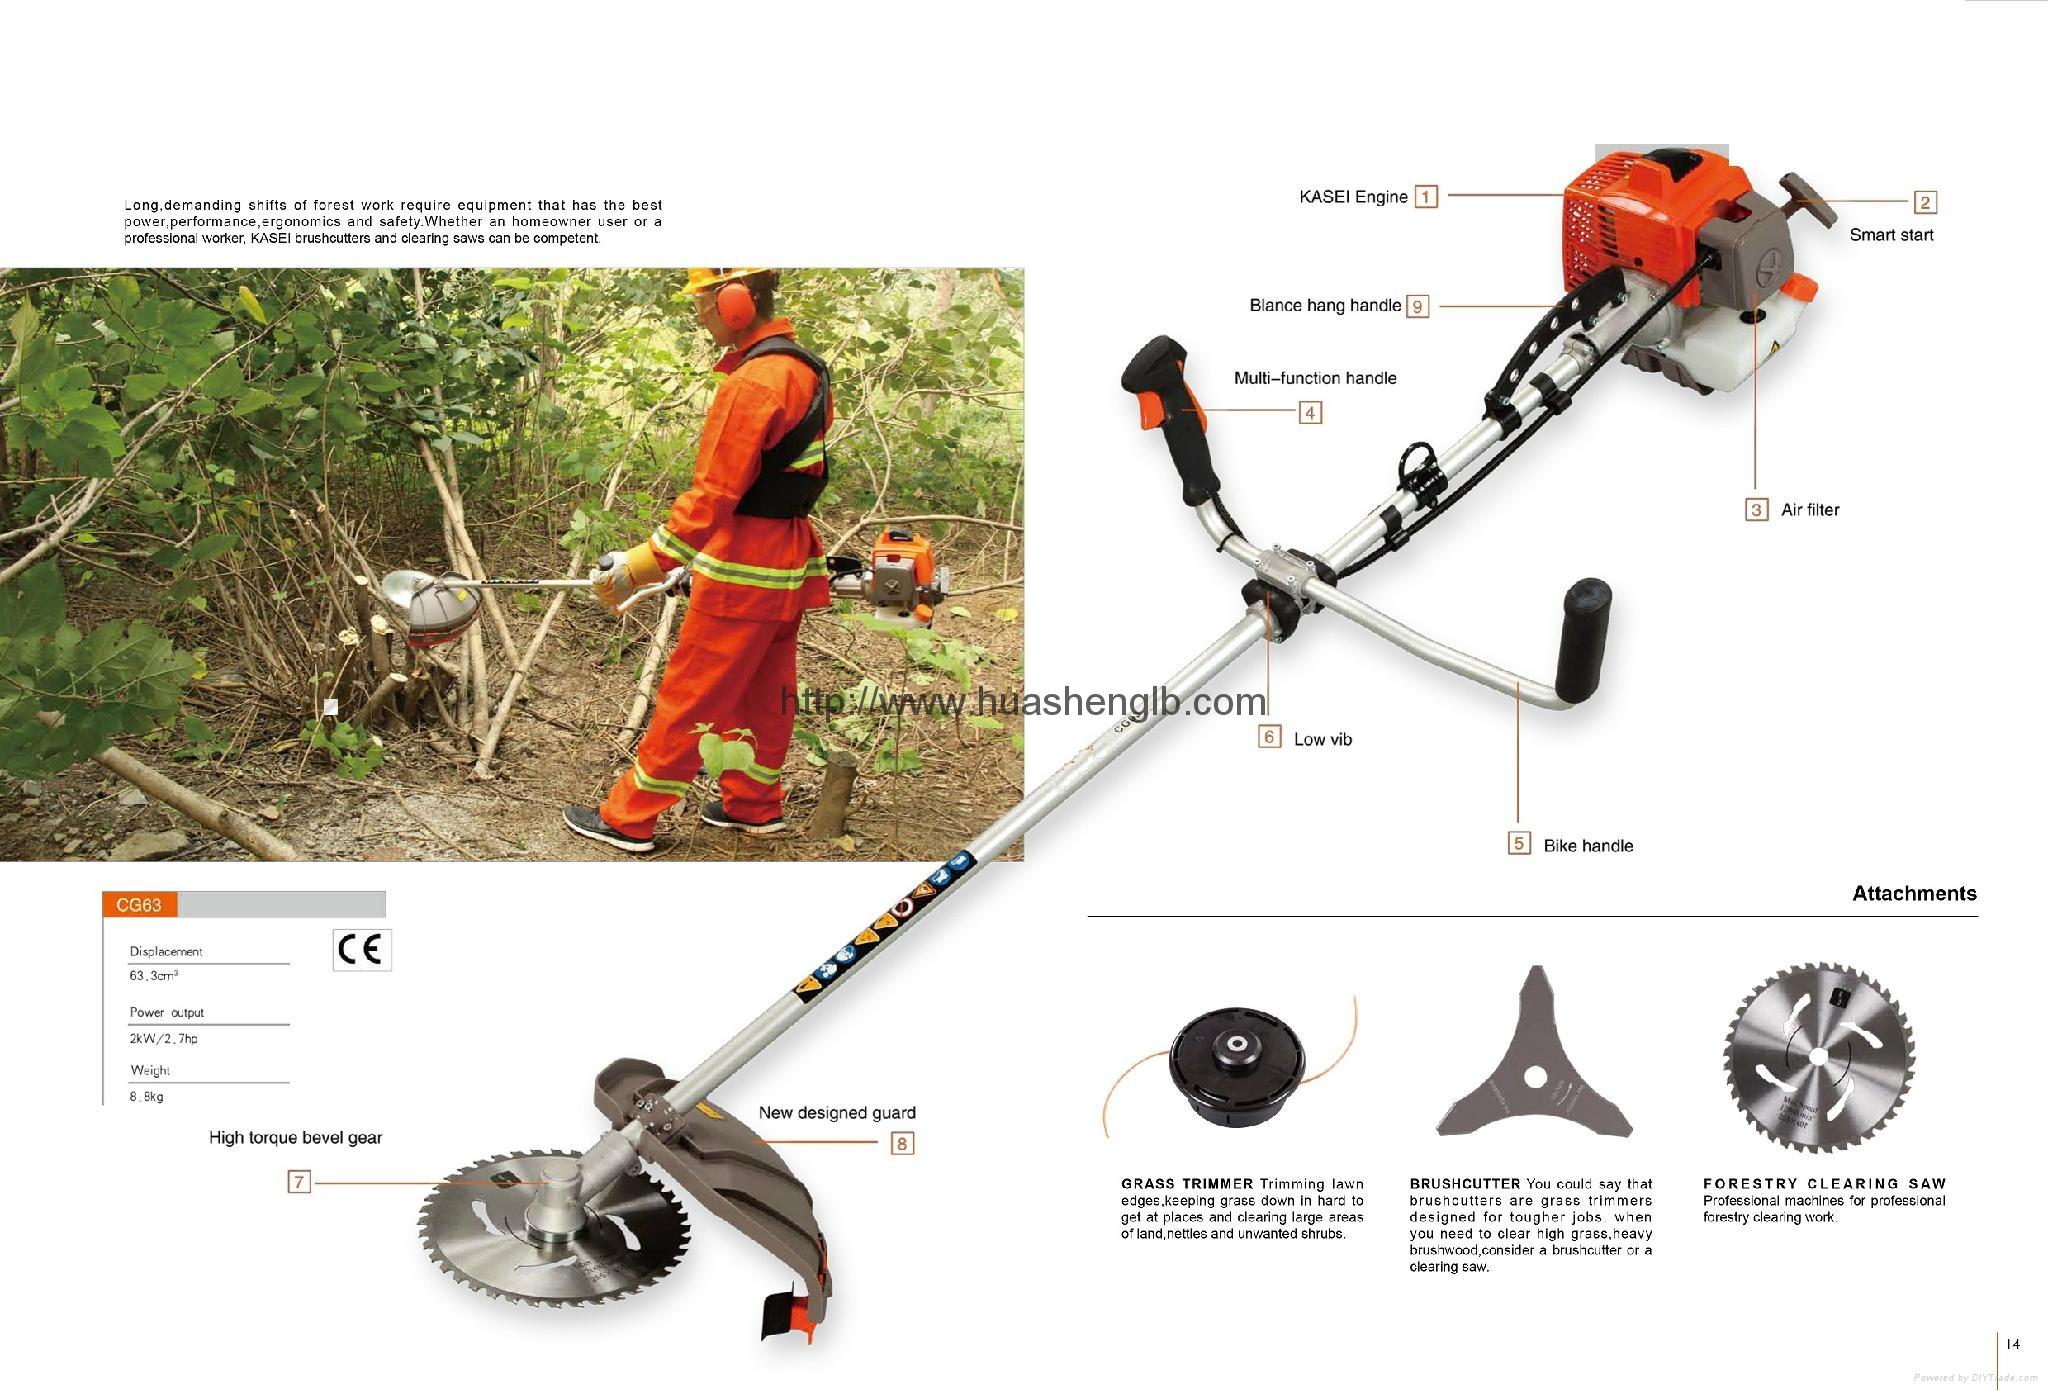 Brush cutter cg650 hs libang china manufacturer for Gardening tools manufacturers